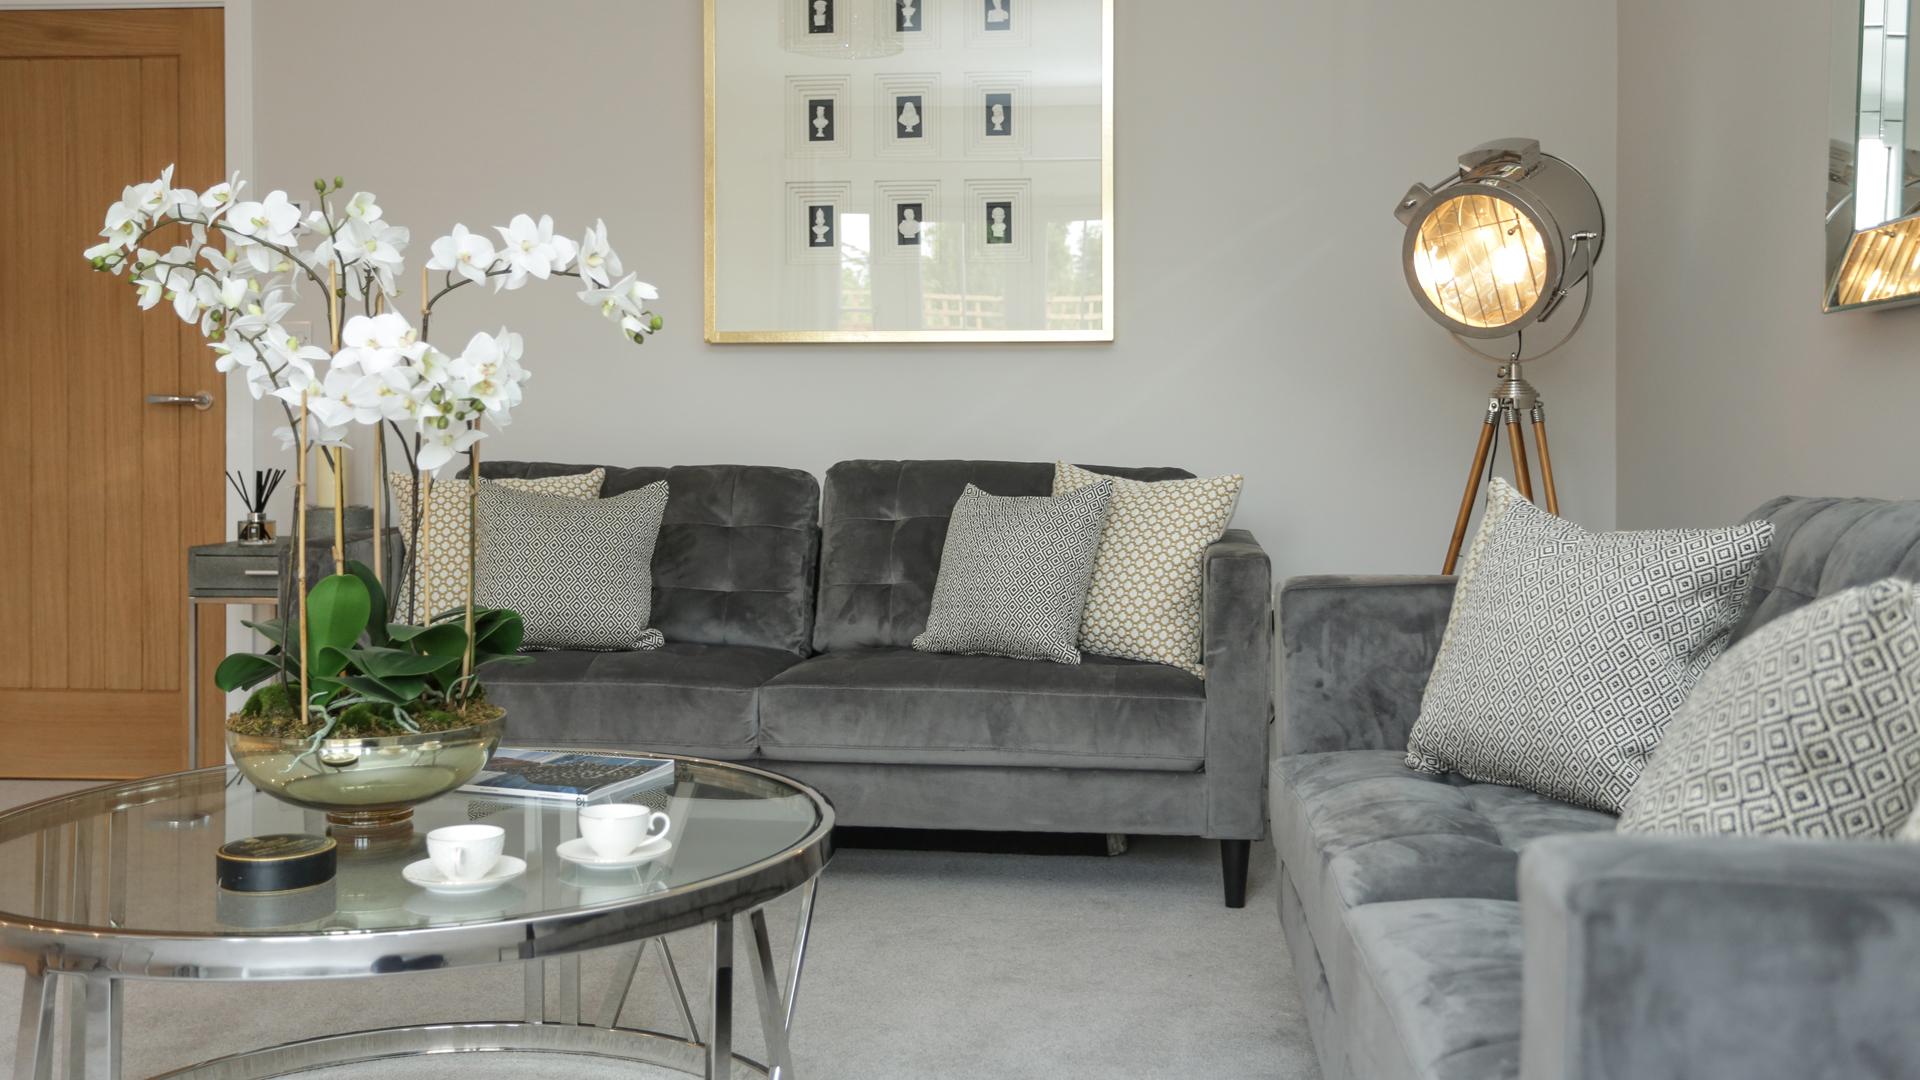 Cobnut Park with two grey sofas and a spotlight.